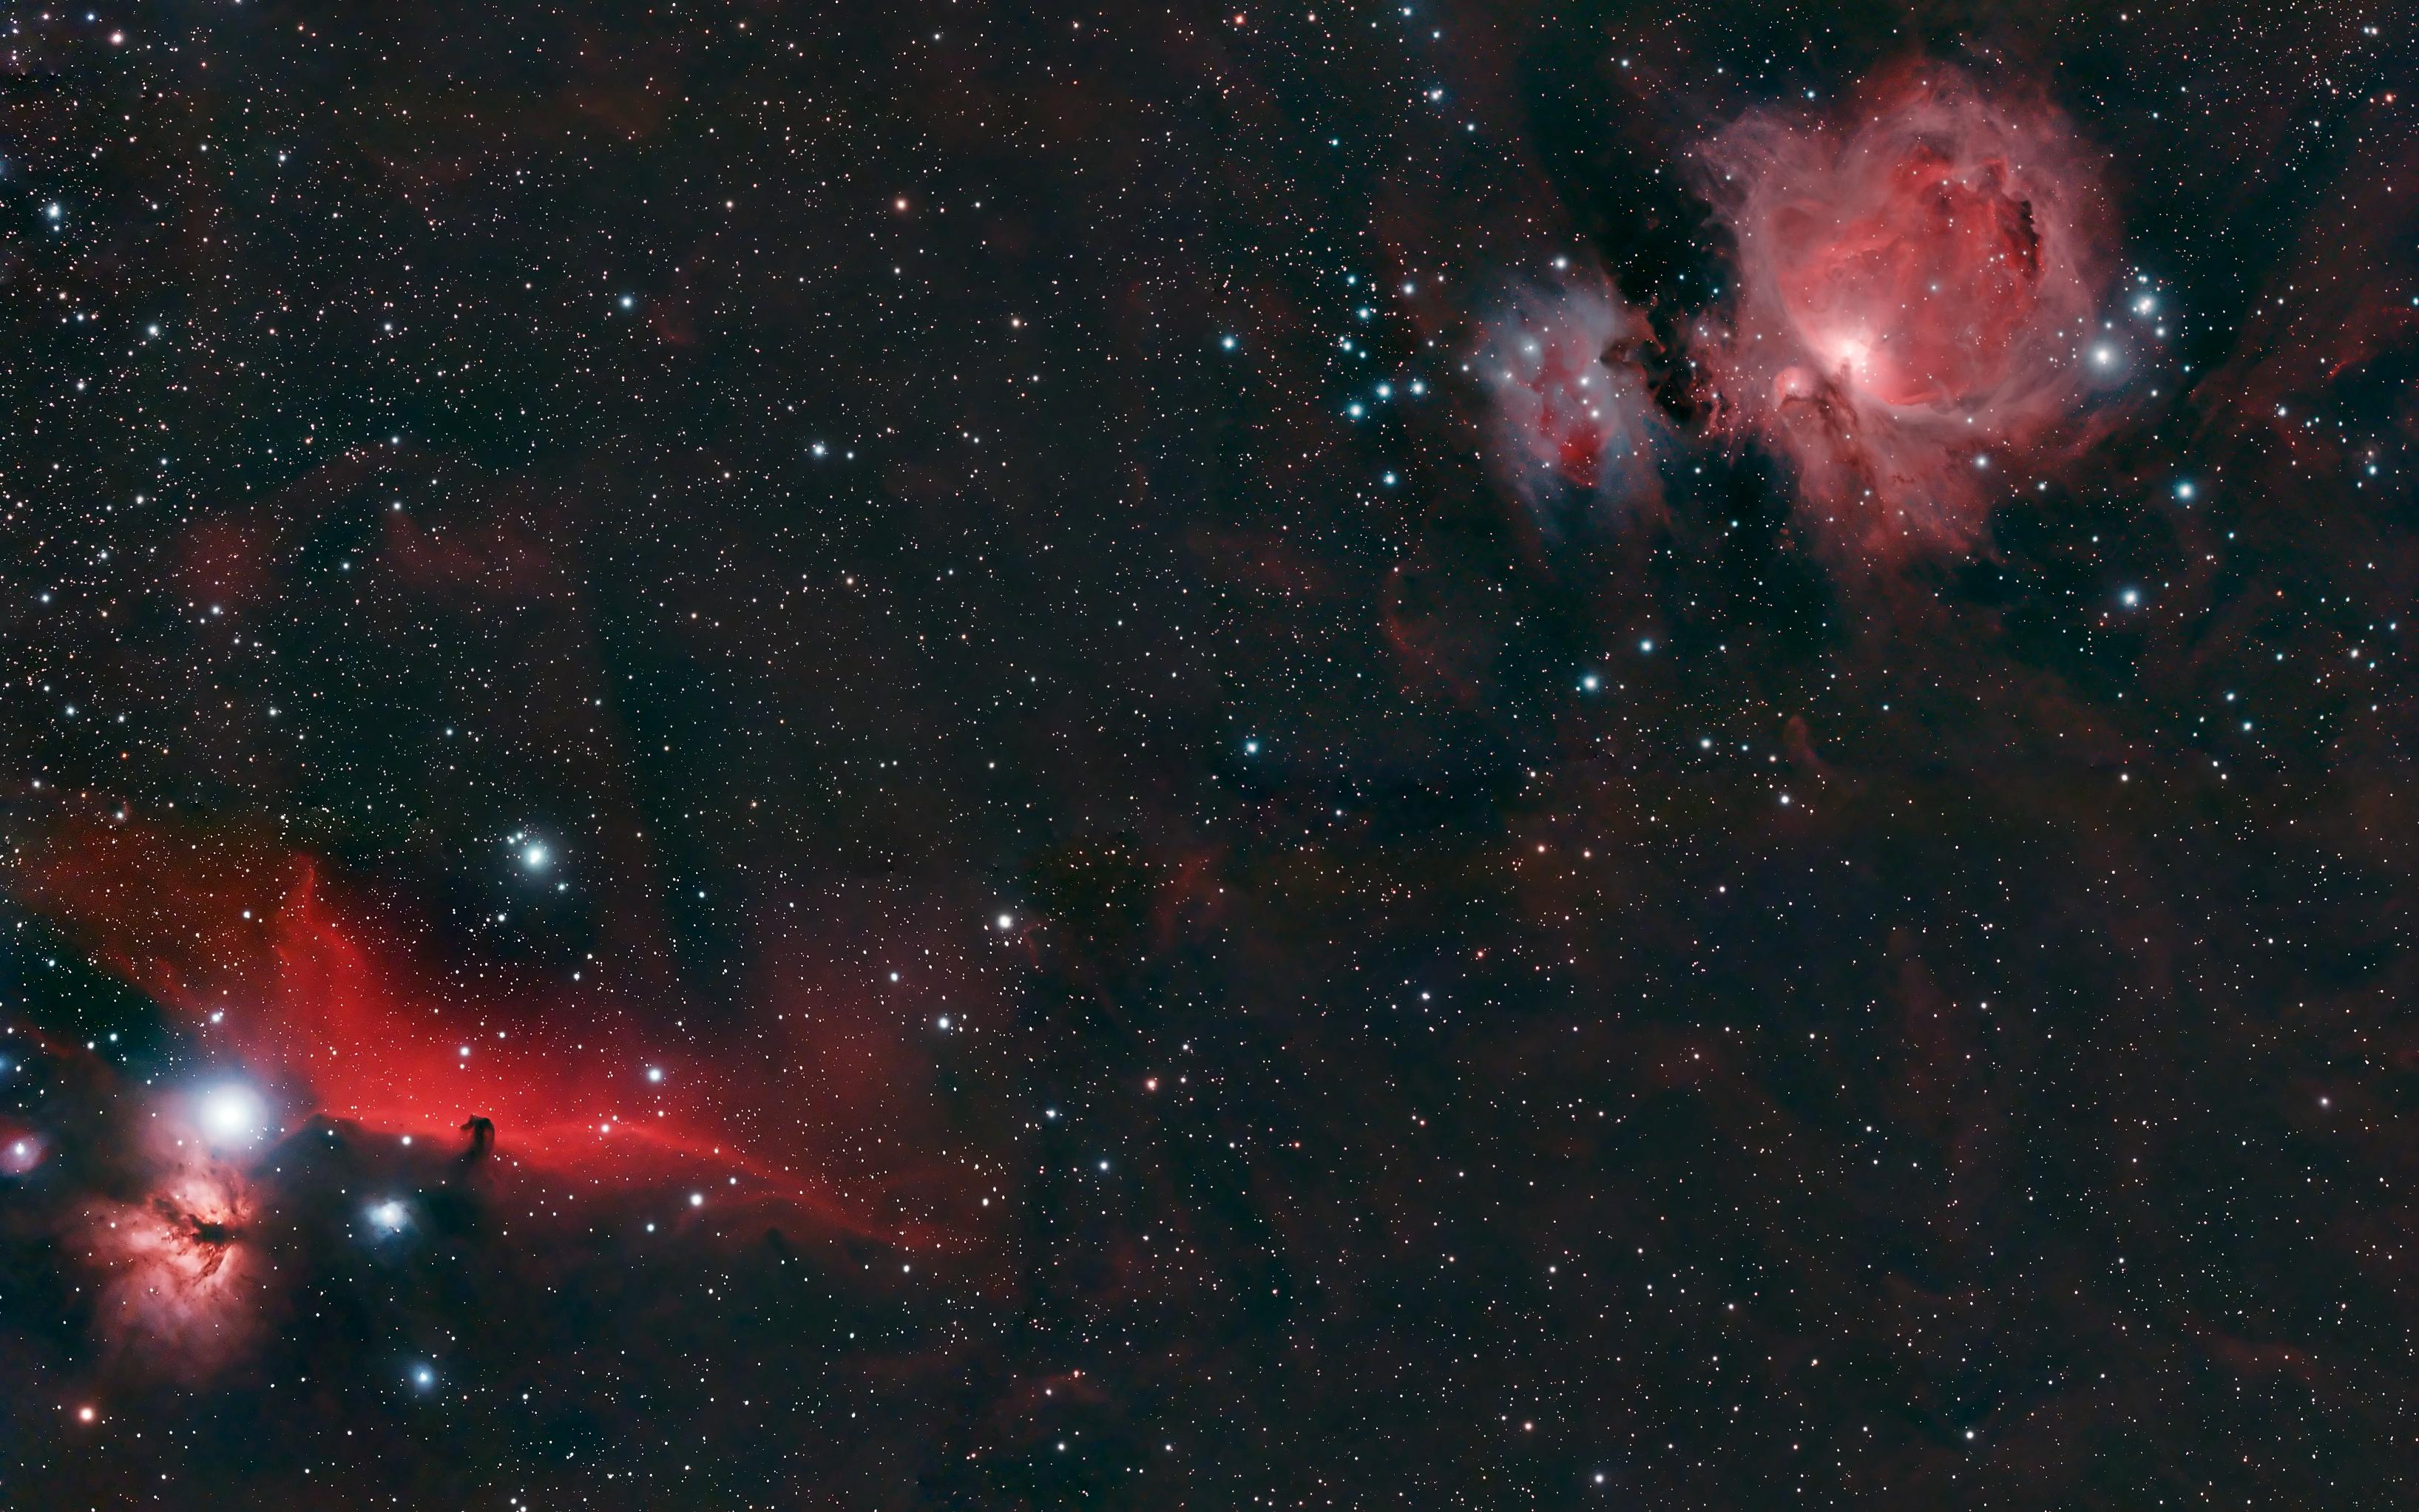 horsehead nebula in orion - photo #19